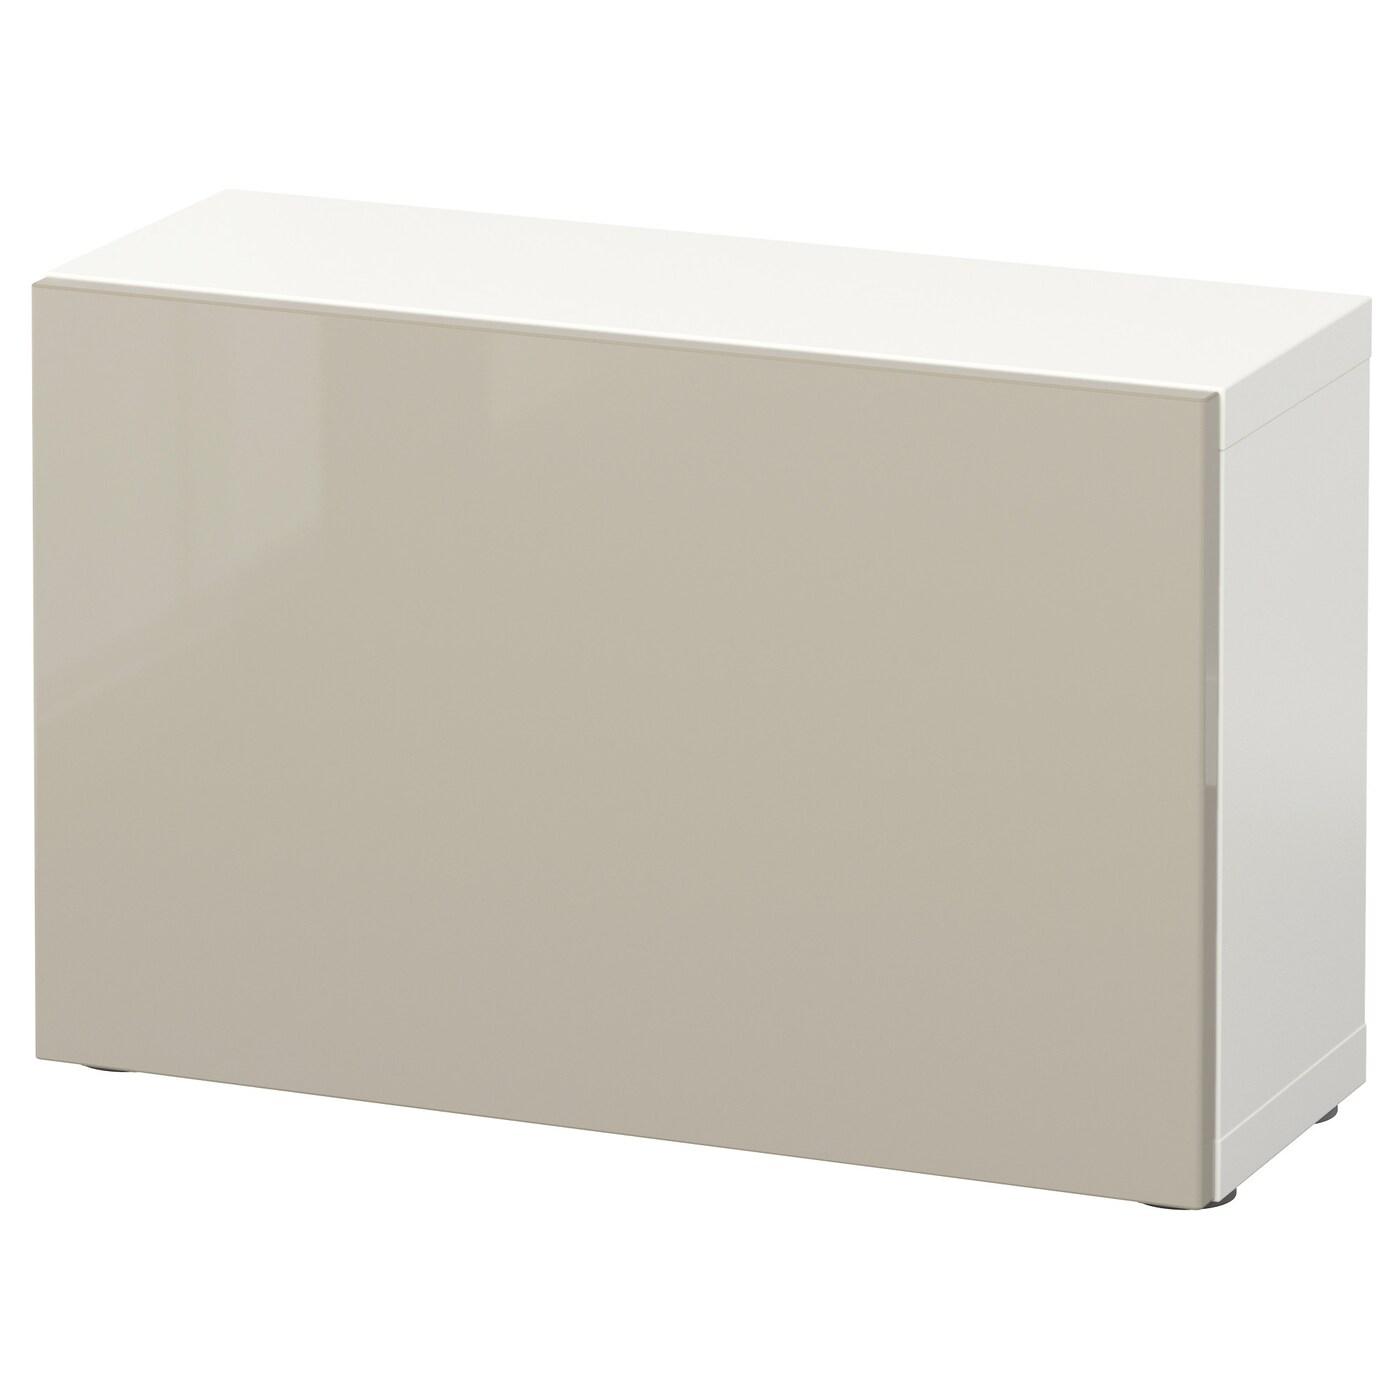 best shelf unit with door white selsviken high gloss beige 60x20x38 cm ikea. Black Bedroom Furniture Sets. Home Design Ideas